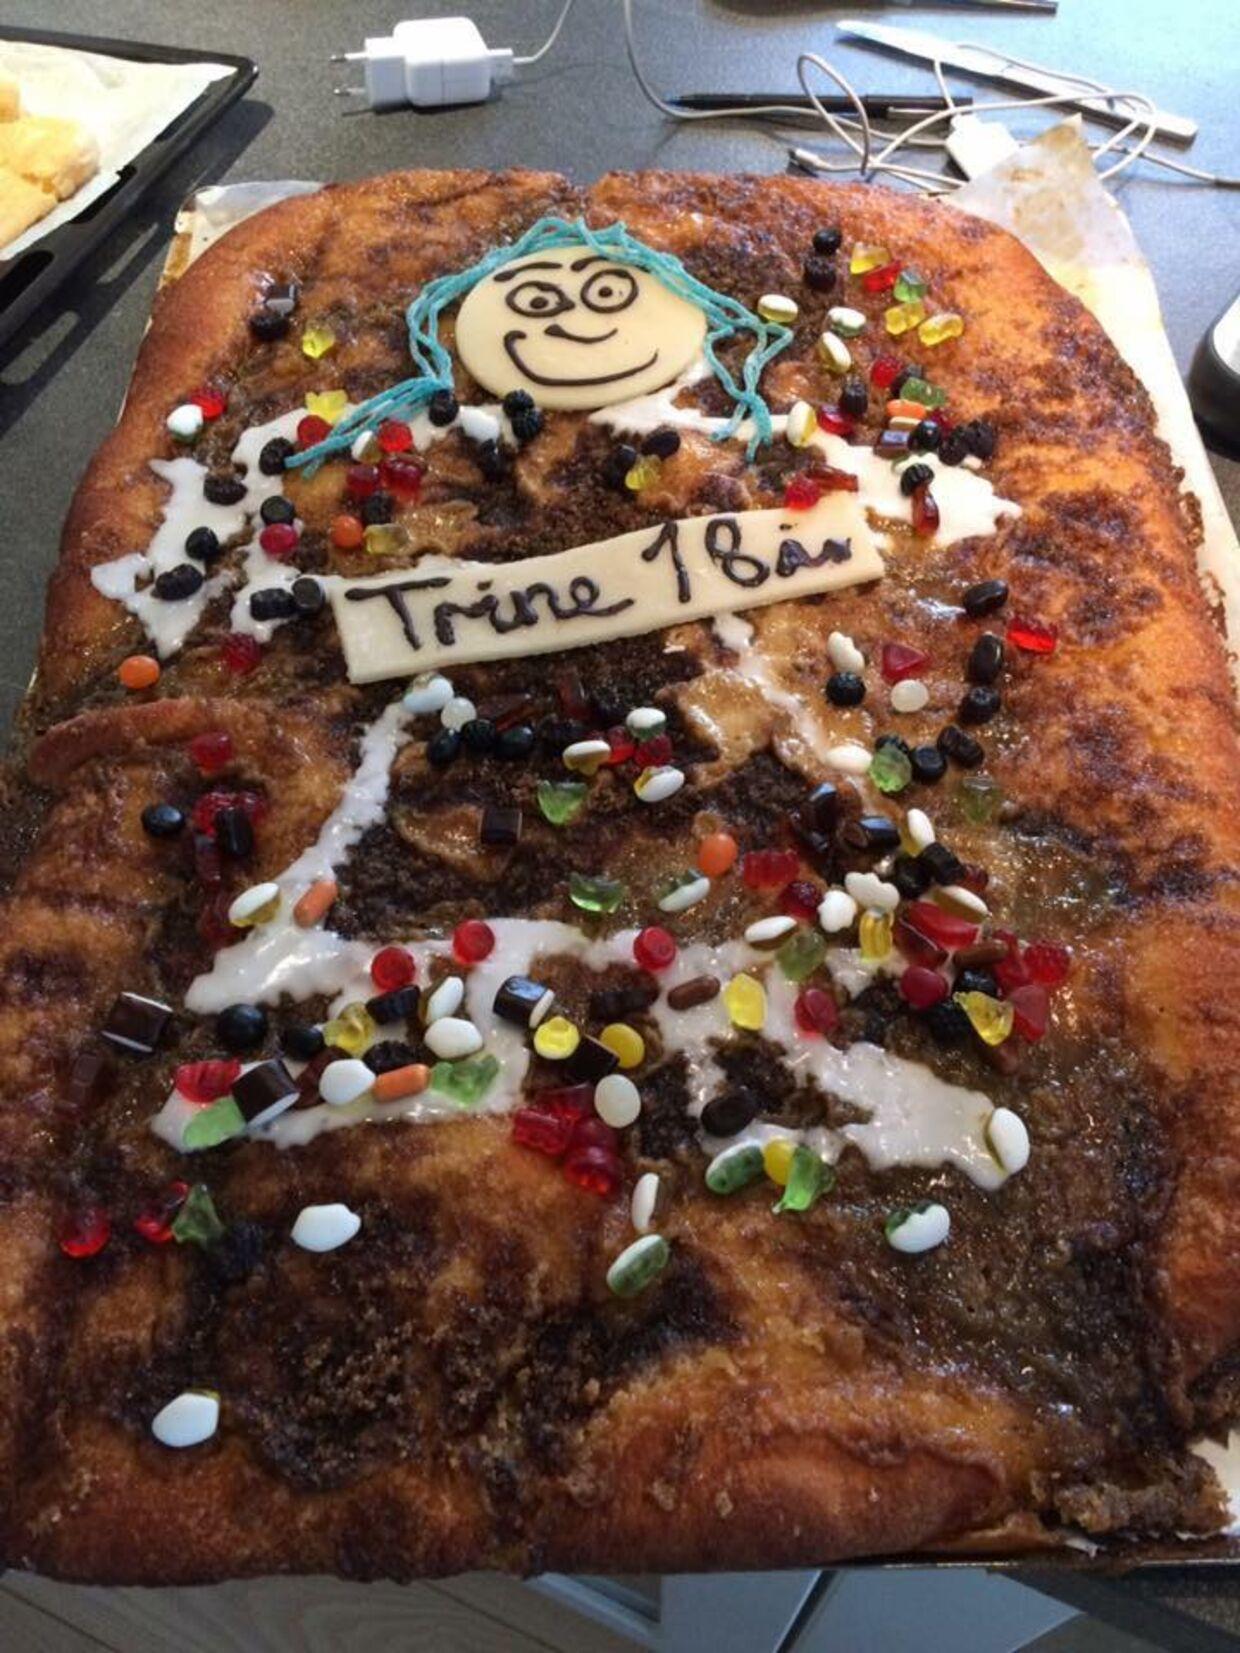 føtex eternitten bager